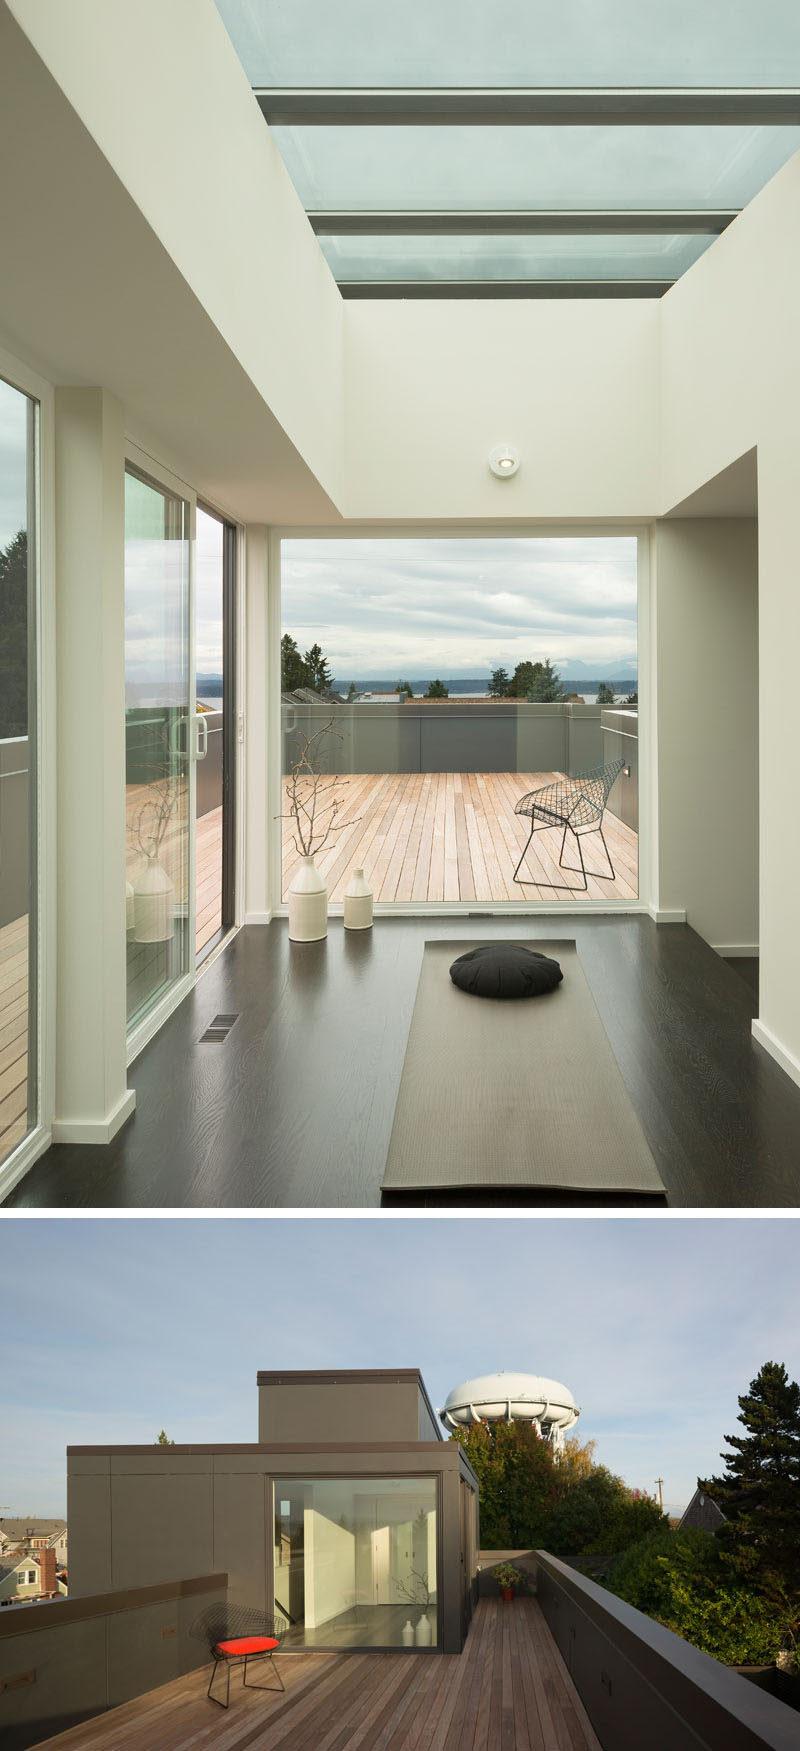 The Magnolia House By Rerucha Studio